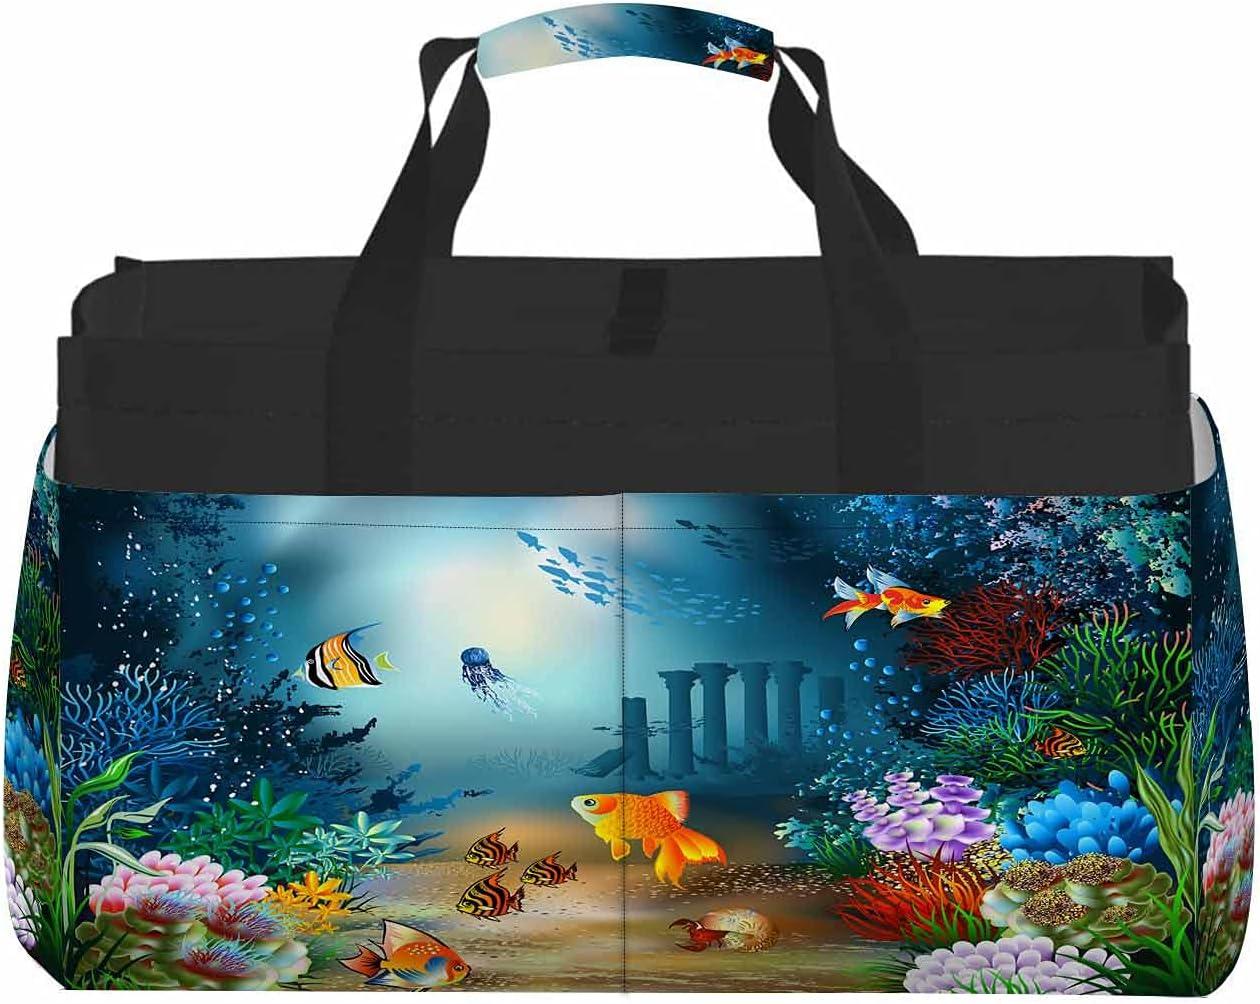 WONDERTIFY Fish Plants Max 53% OFF Large Tote World O Seaweed Luxury Bag Underwater